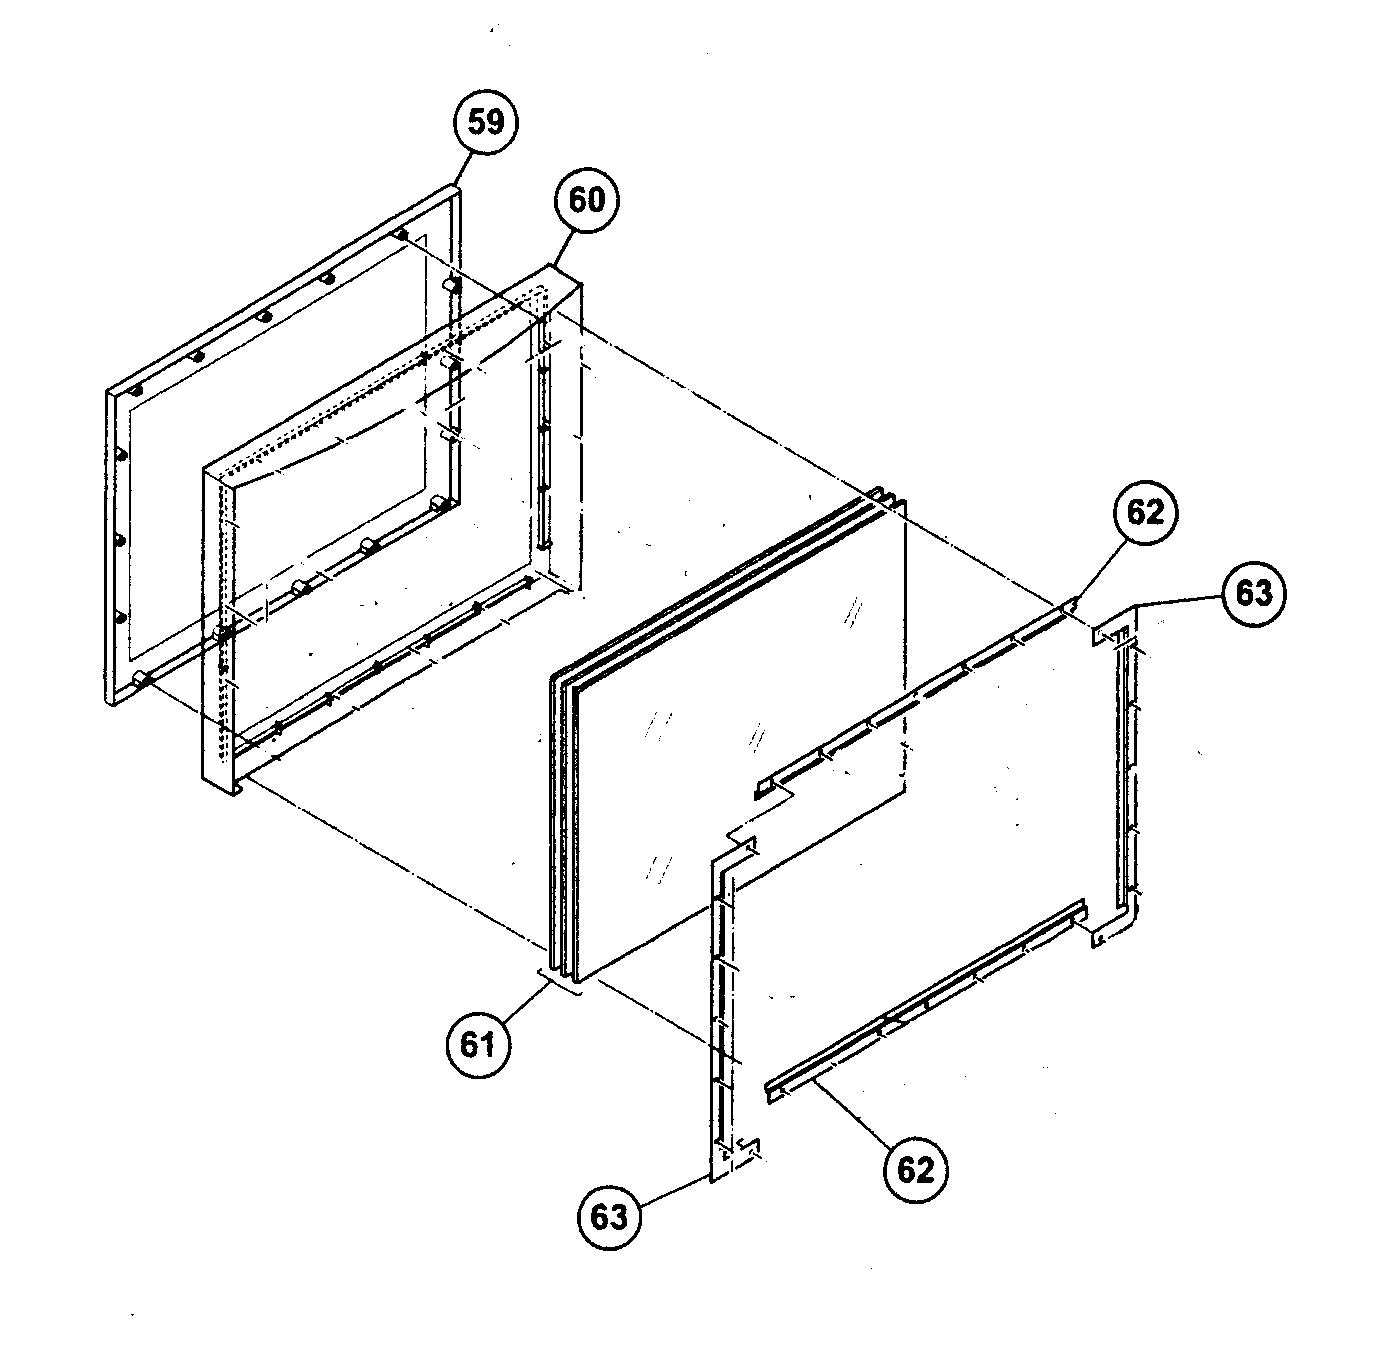 Jvc model AV-48P776 projection/digital 42